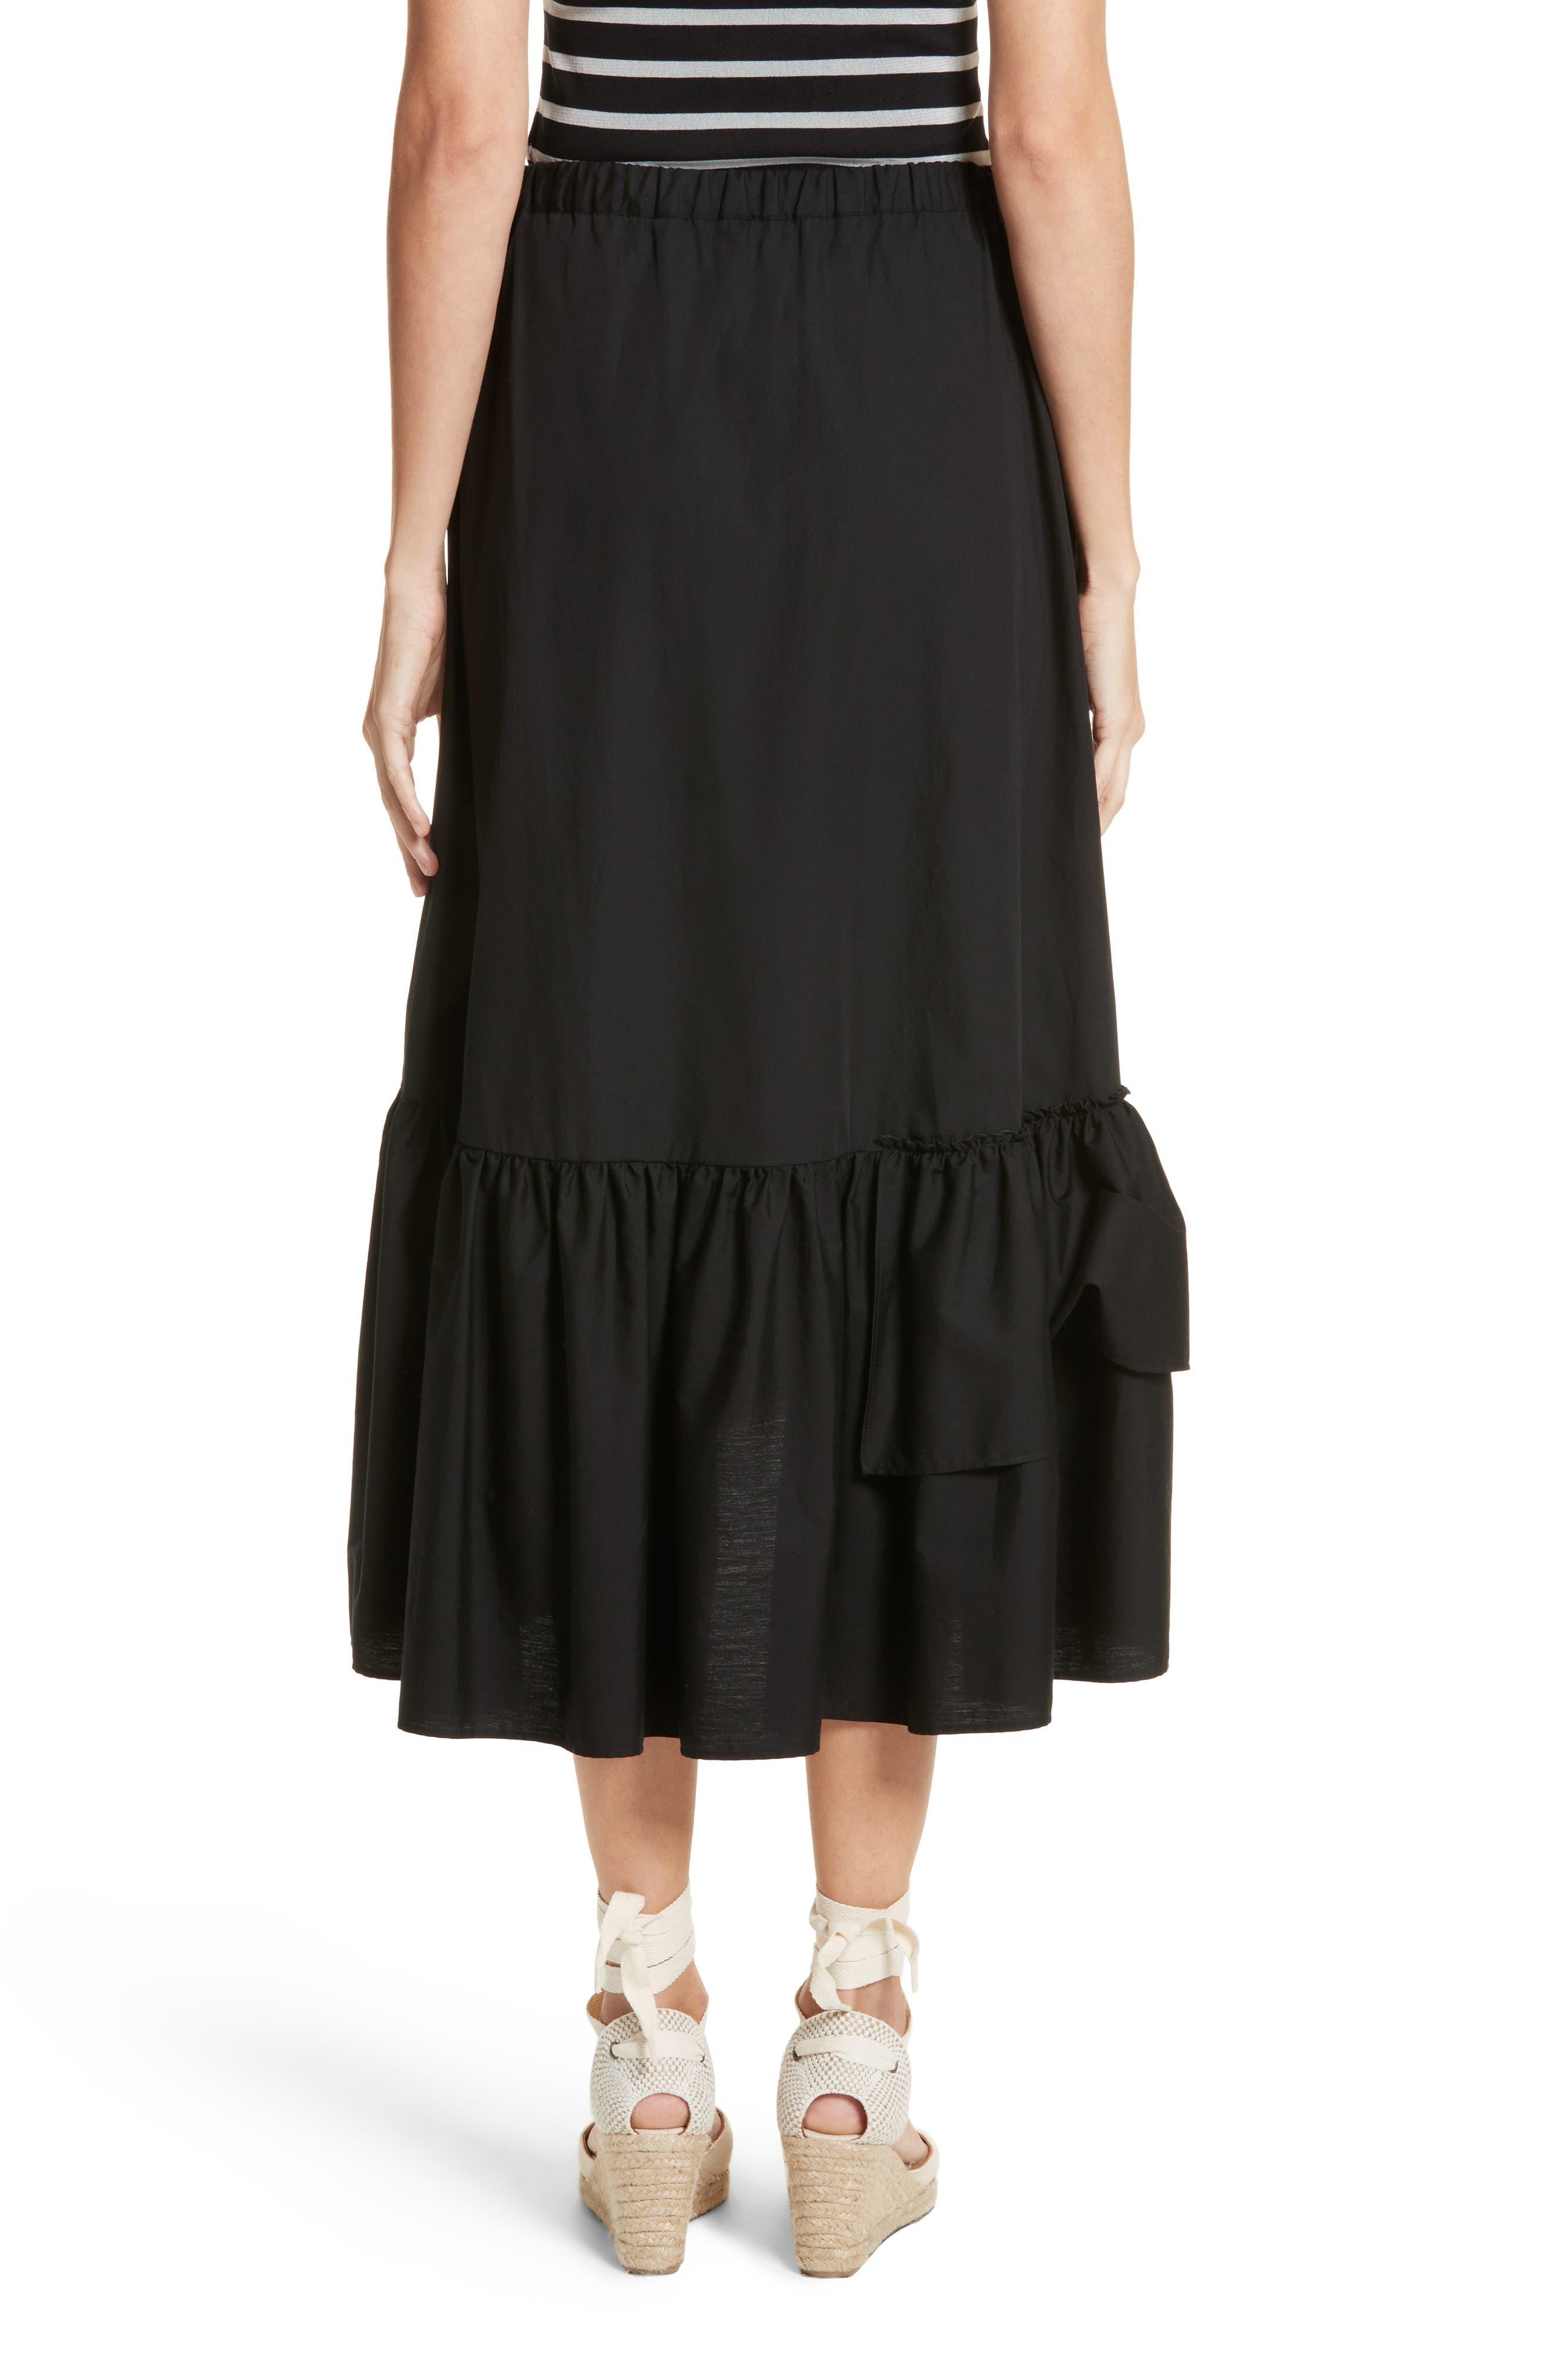 FUZZI,                             Ruffled Poplin Skirt,                             Alternate thumbnail 2, color,                             001